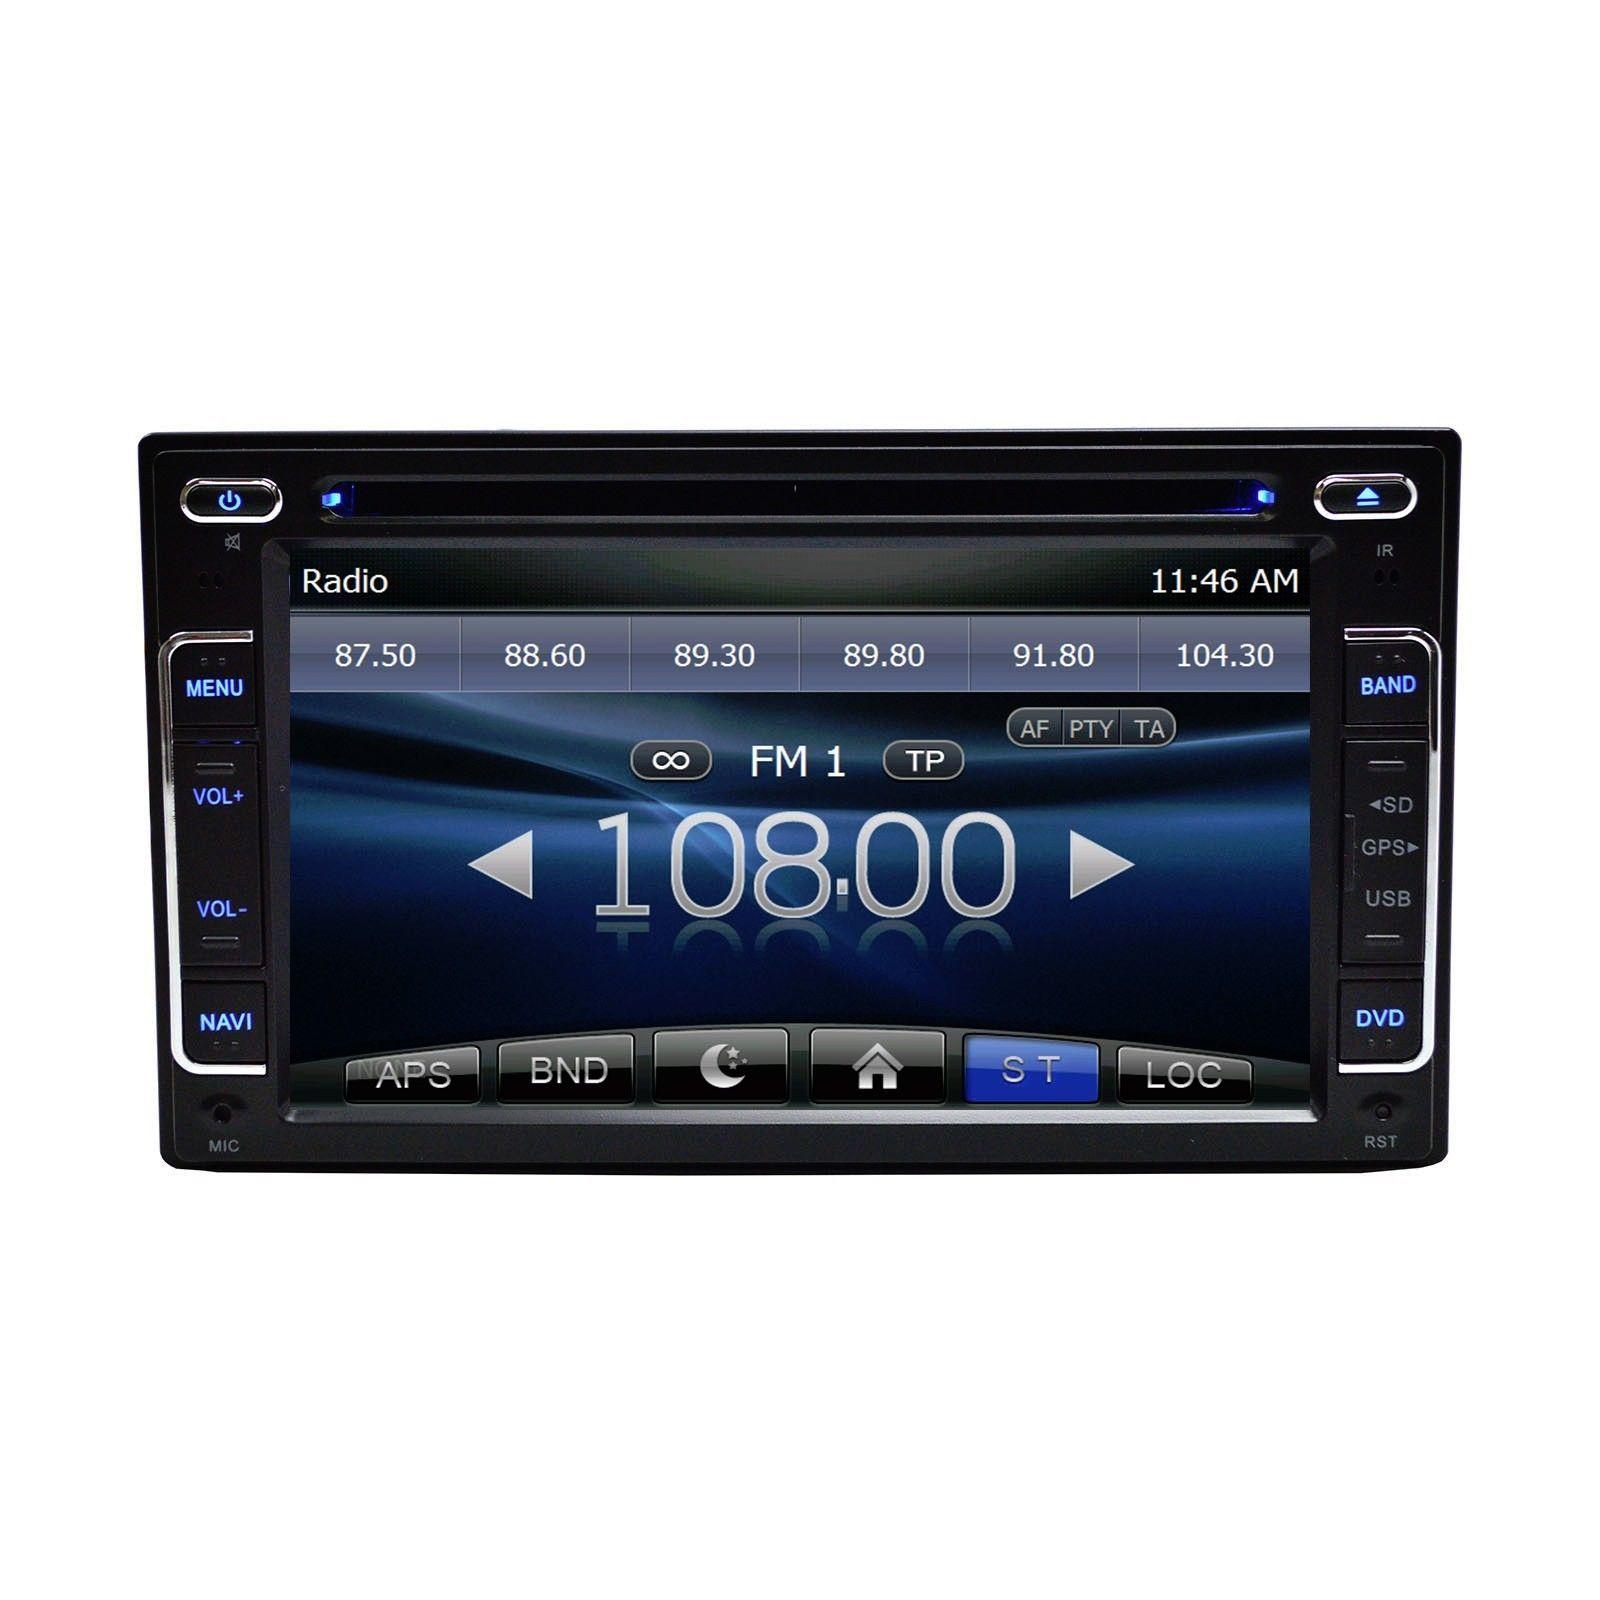 Lexus ES 1997-2001 Bluetooth Radio GPS Navigation Touchscreen DVD Mp3 System